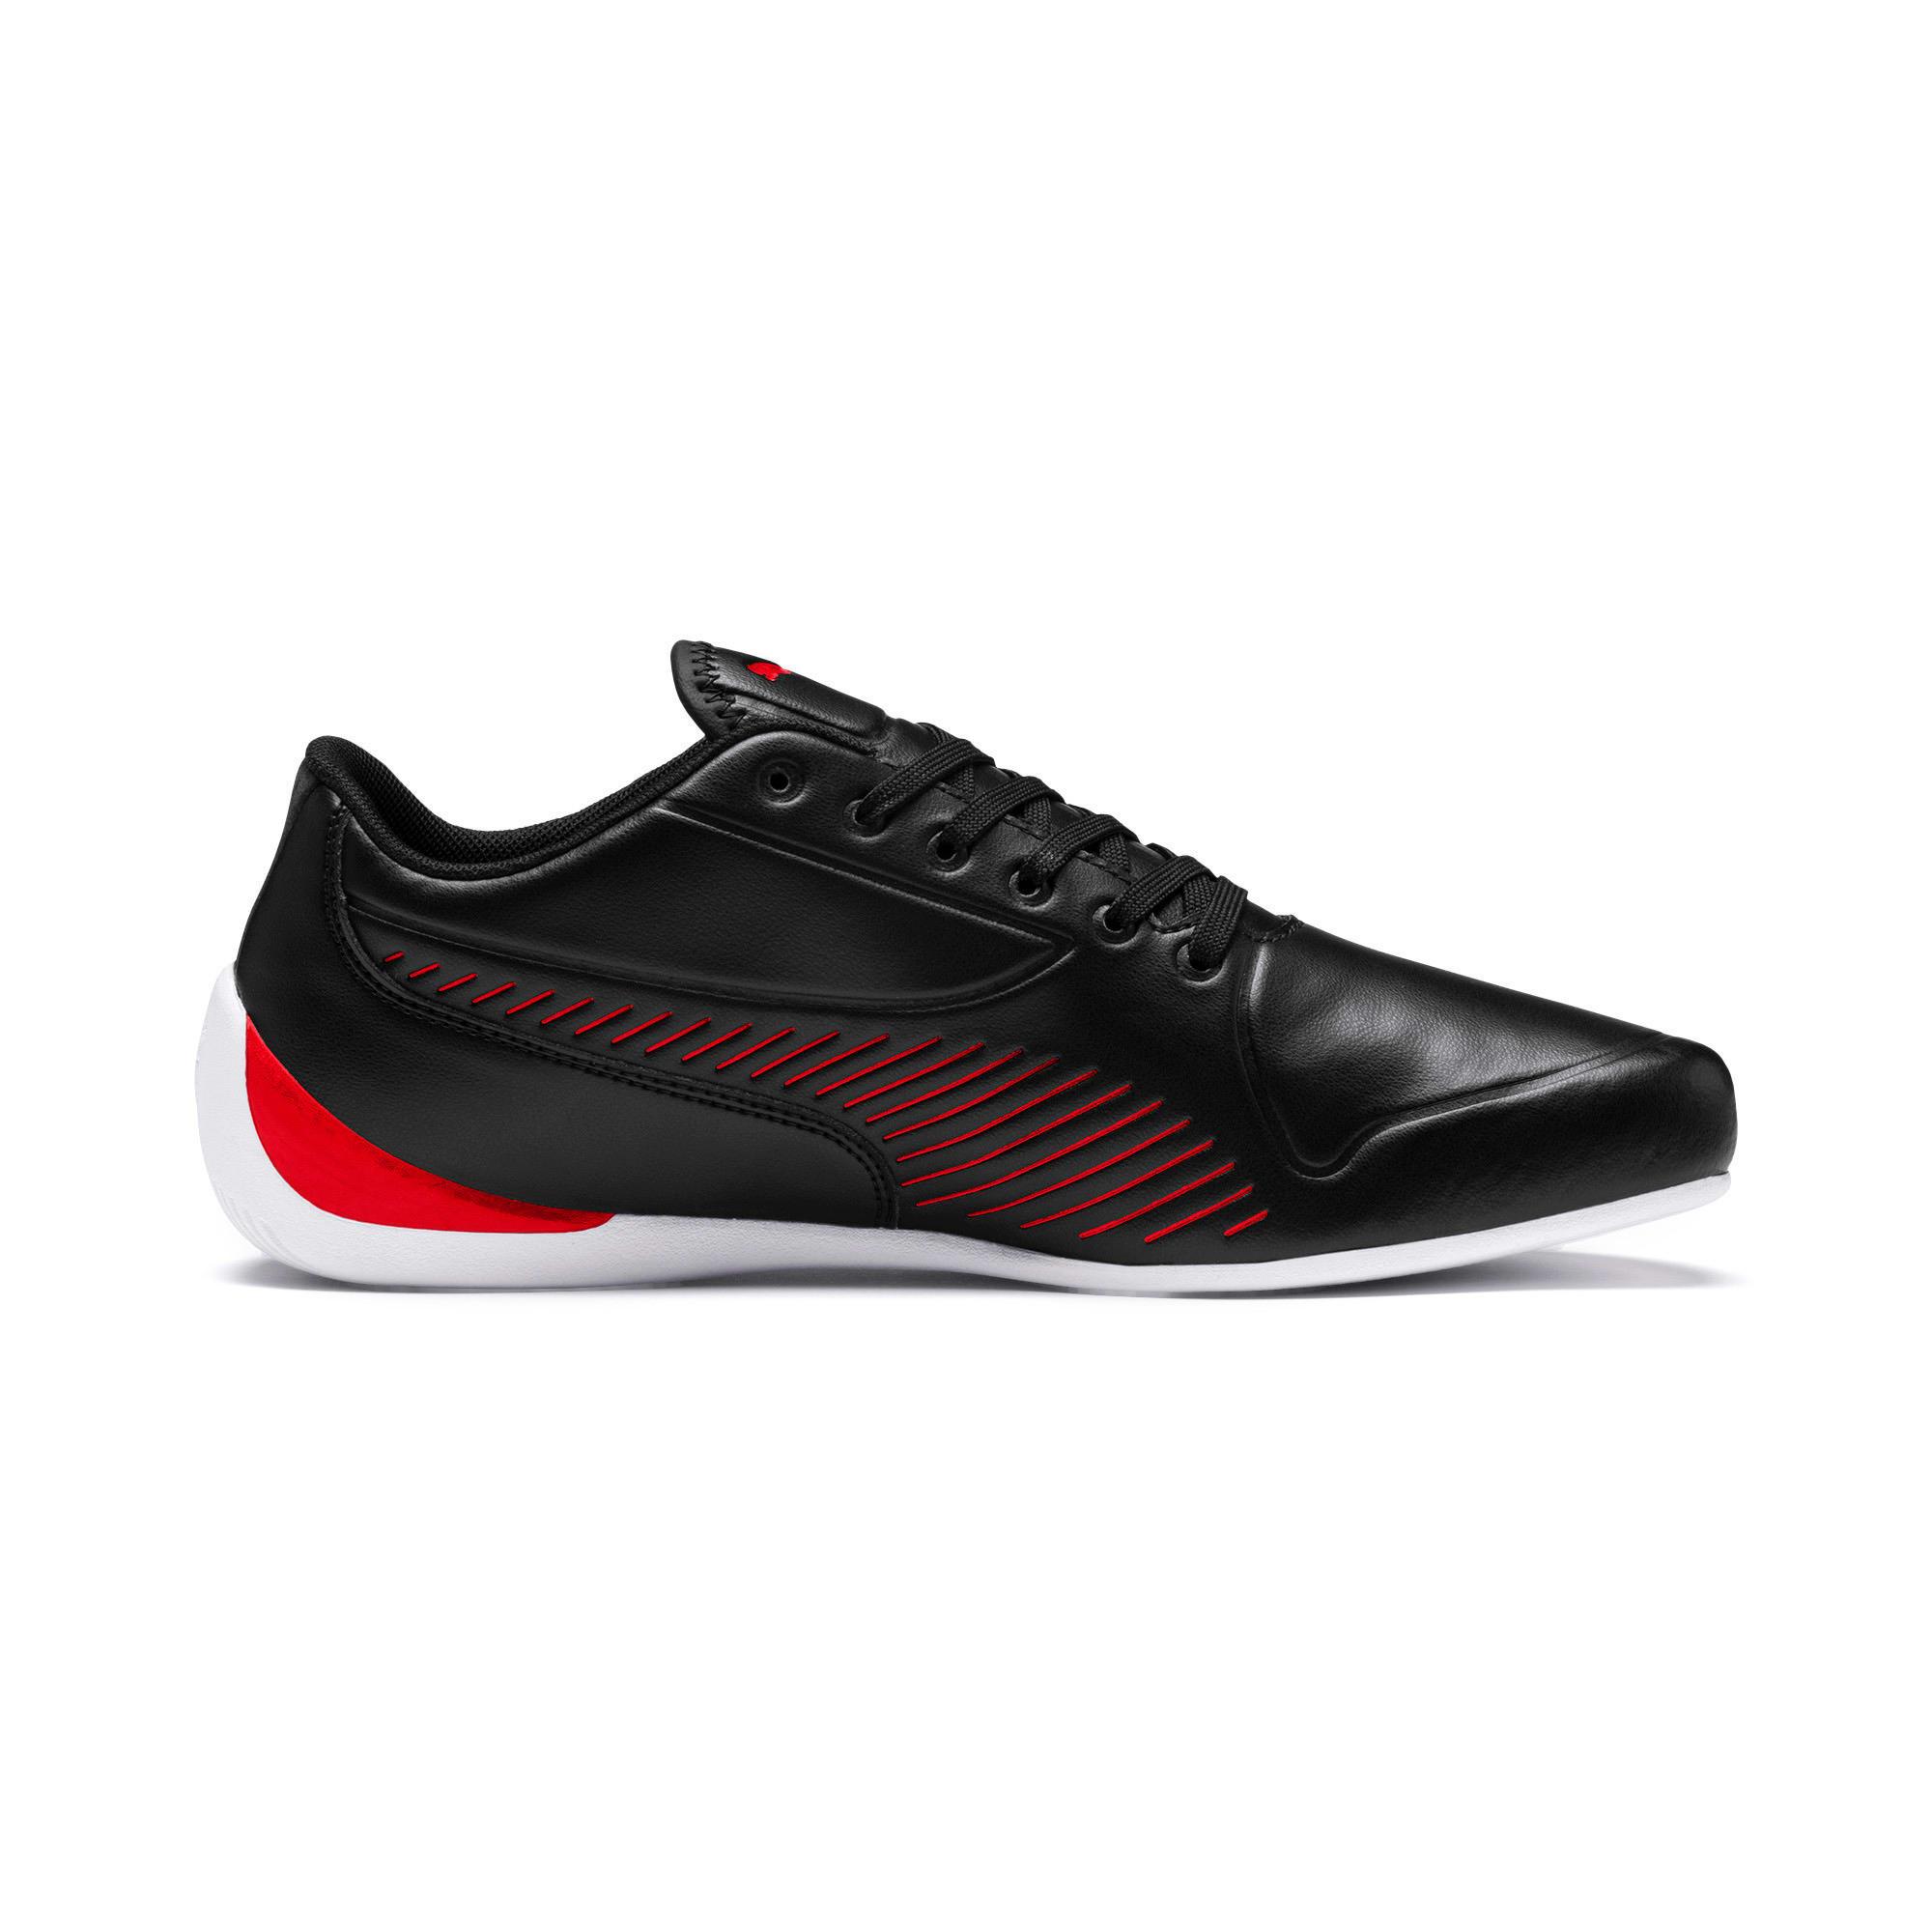 Miniatura 5 de Zapatos Scuderia Ferrari Drift Cat 7S Ultra para hombre, Puma Black-Rosso Corsa, mediano